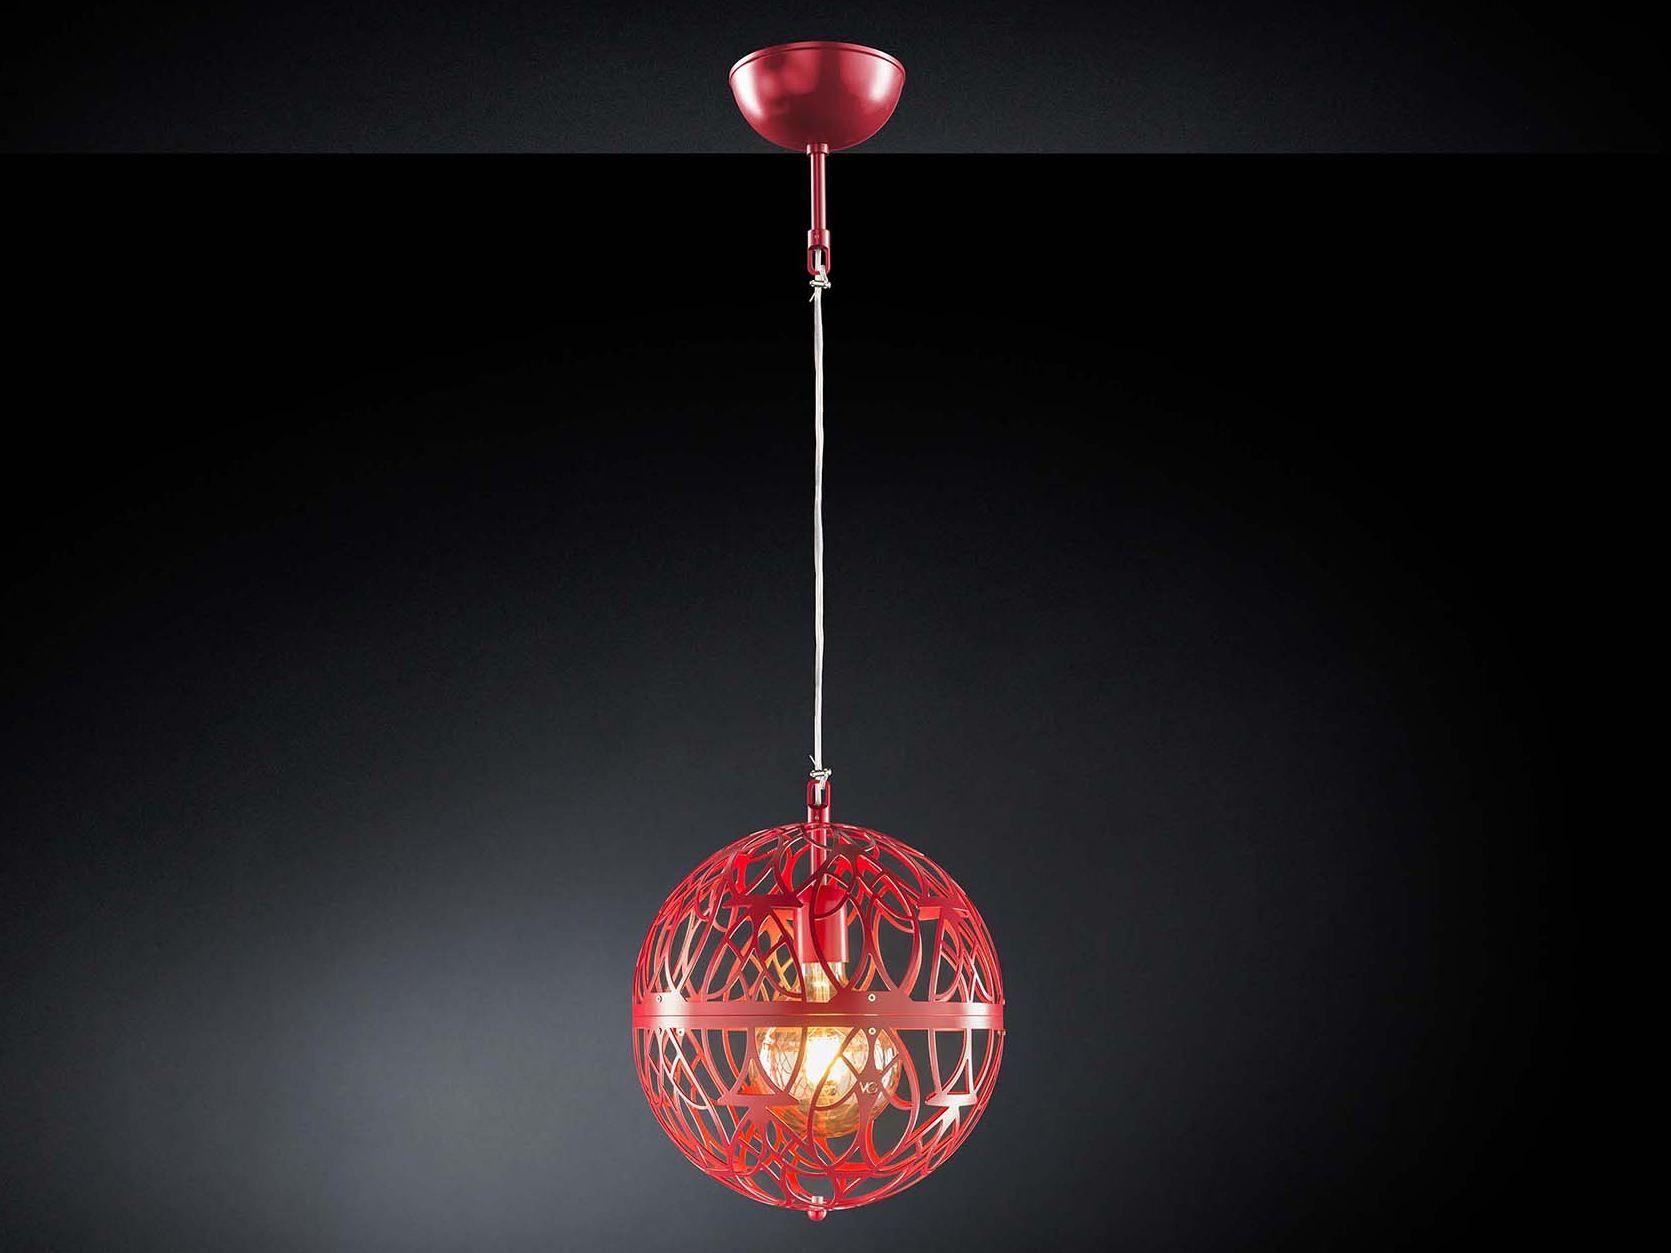 lampada a sospensione a led in acciaio arabesque marte by vgnewtrend - Larabesque Lampade